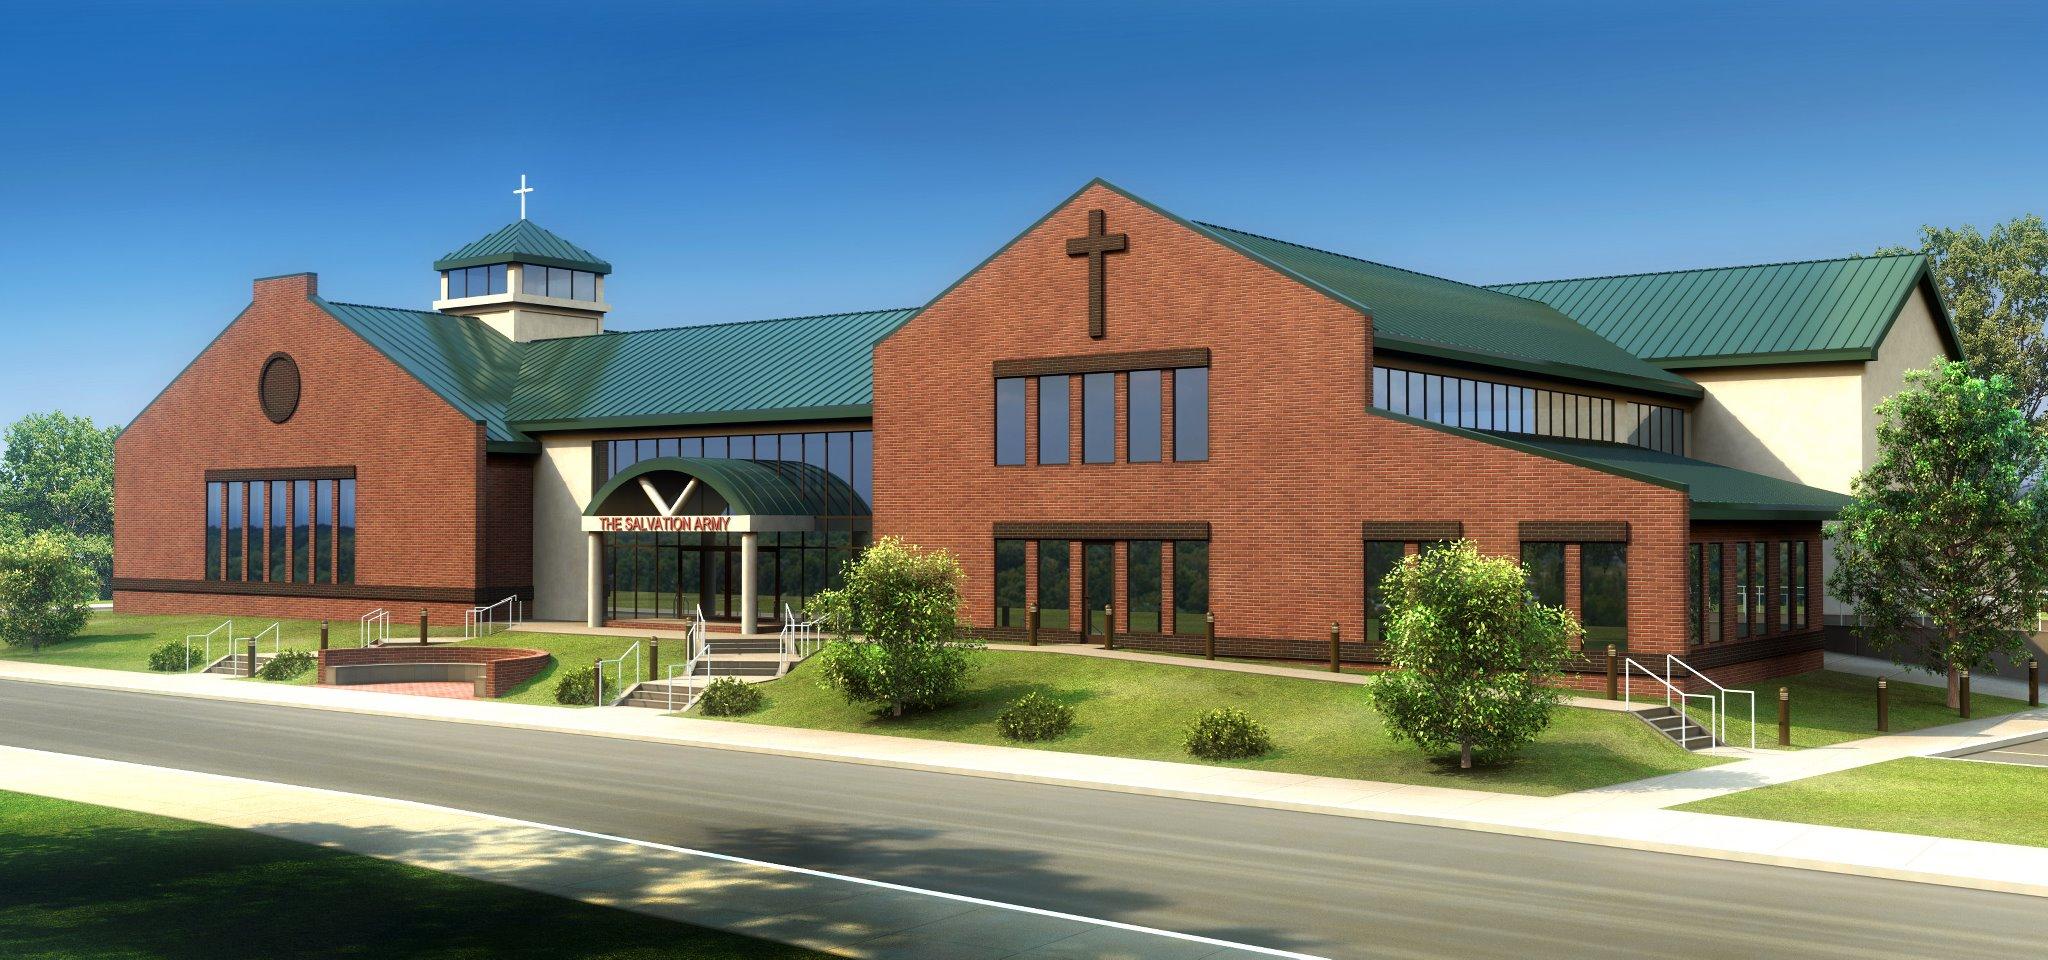 The Salvation Army Montclair